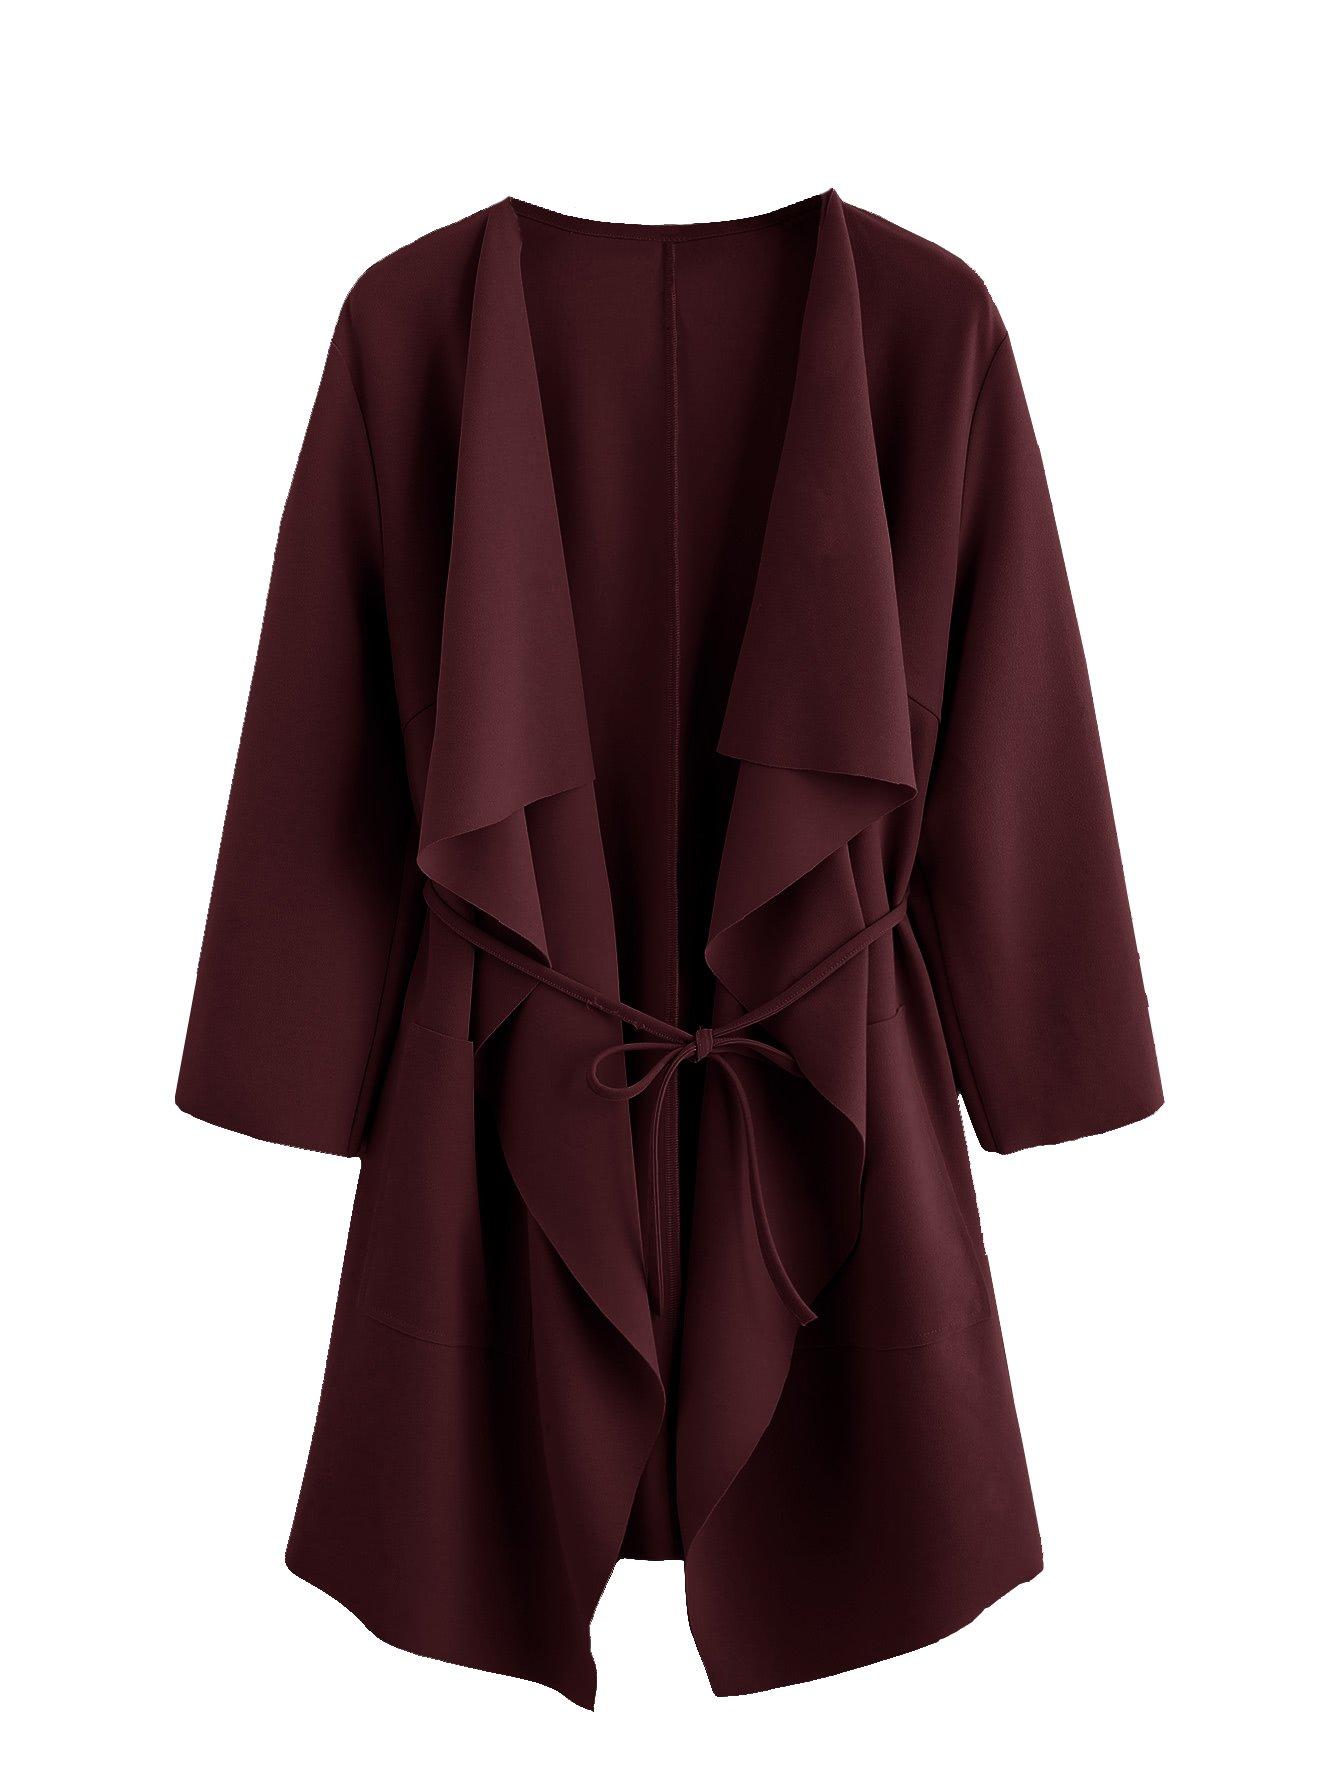 Romwe Women's Raw Cut Hem Waterfall Collar Long Sleeve Wrap Trench Coat Cardigan Burgundy L